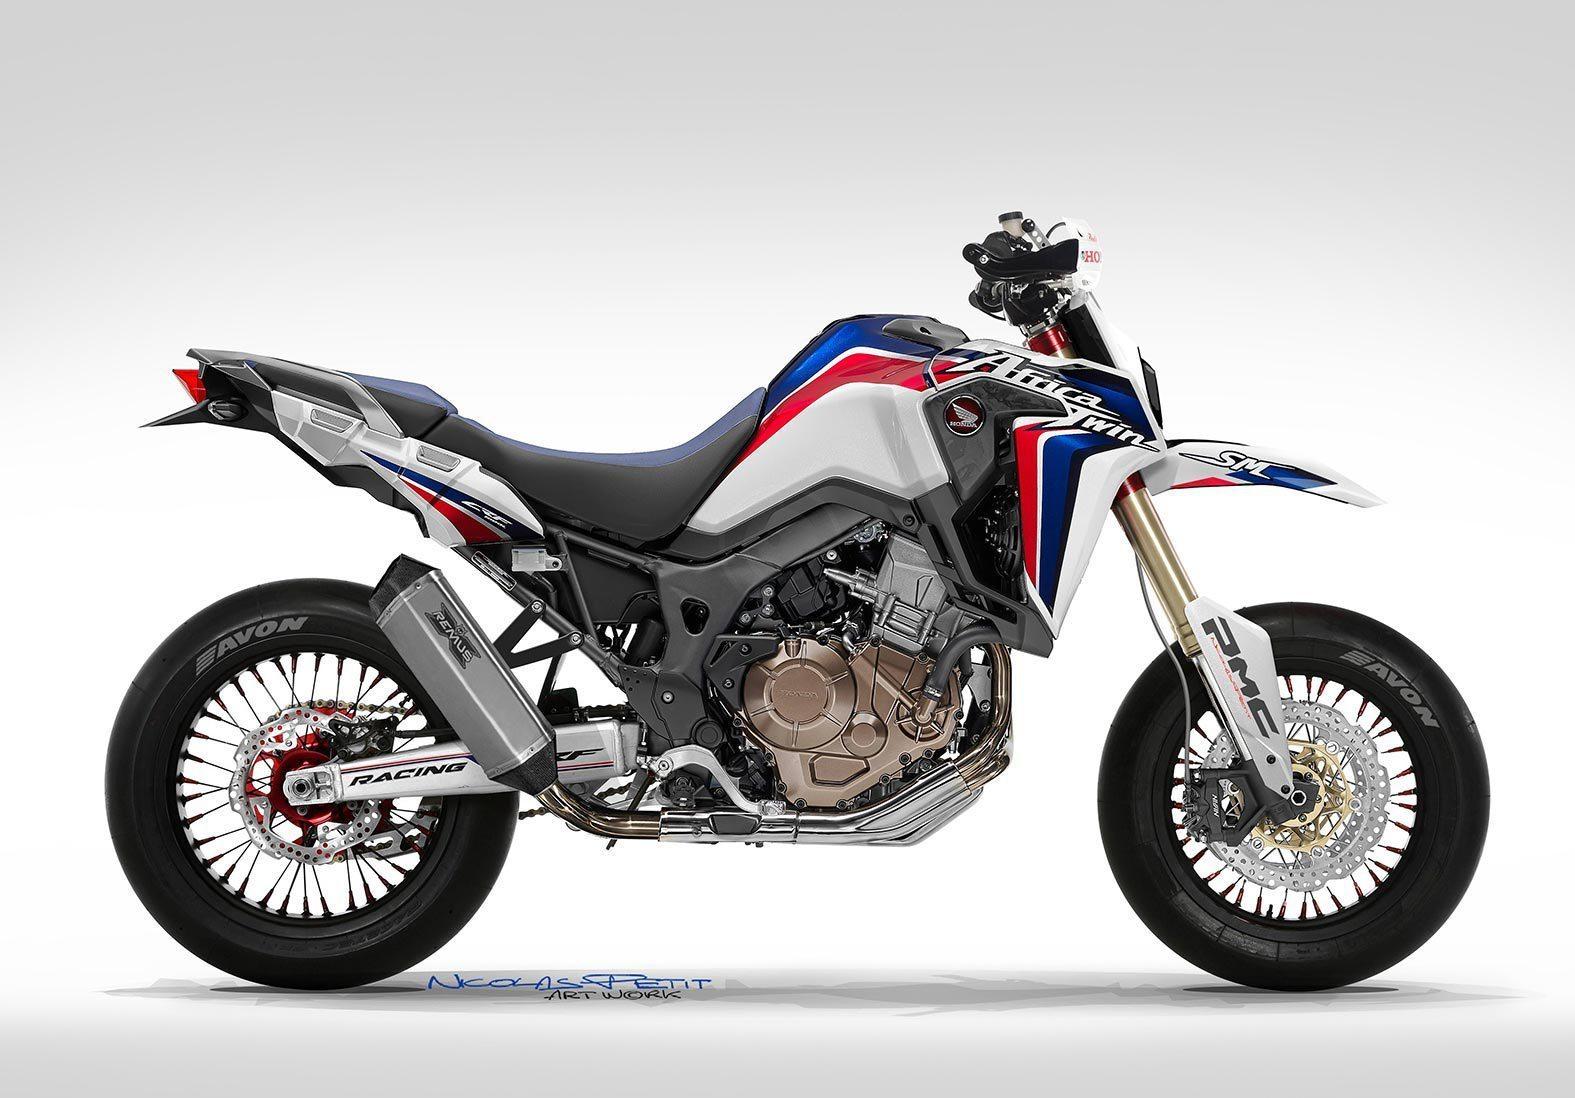 20170228_Honda-Africa-Twin-CRF1000L-supermoto-Nicolas-Petit.jpg